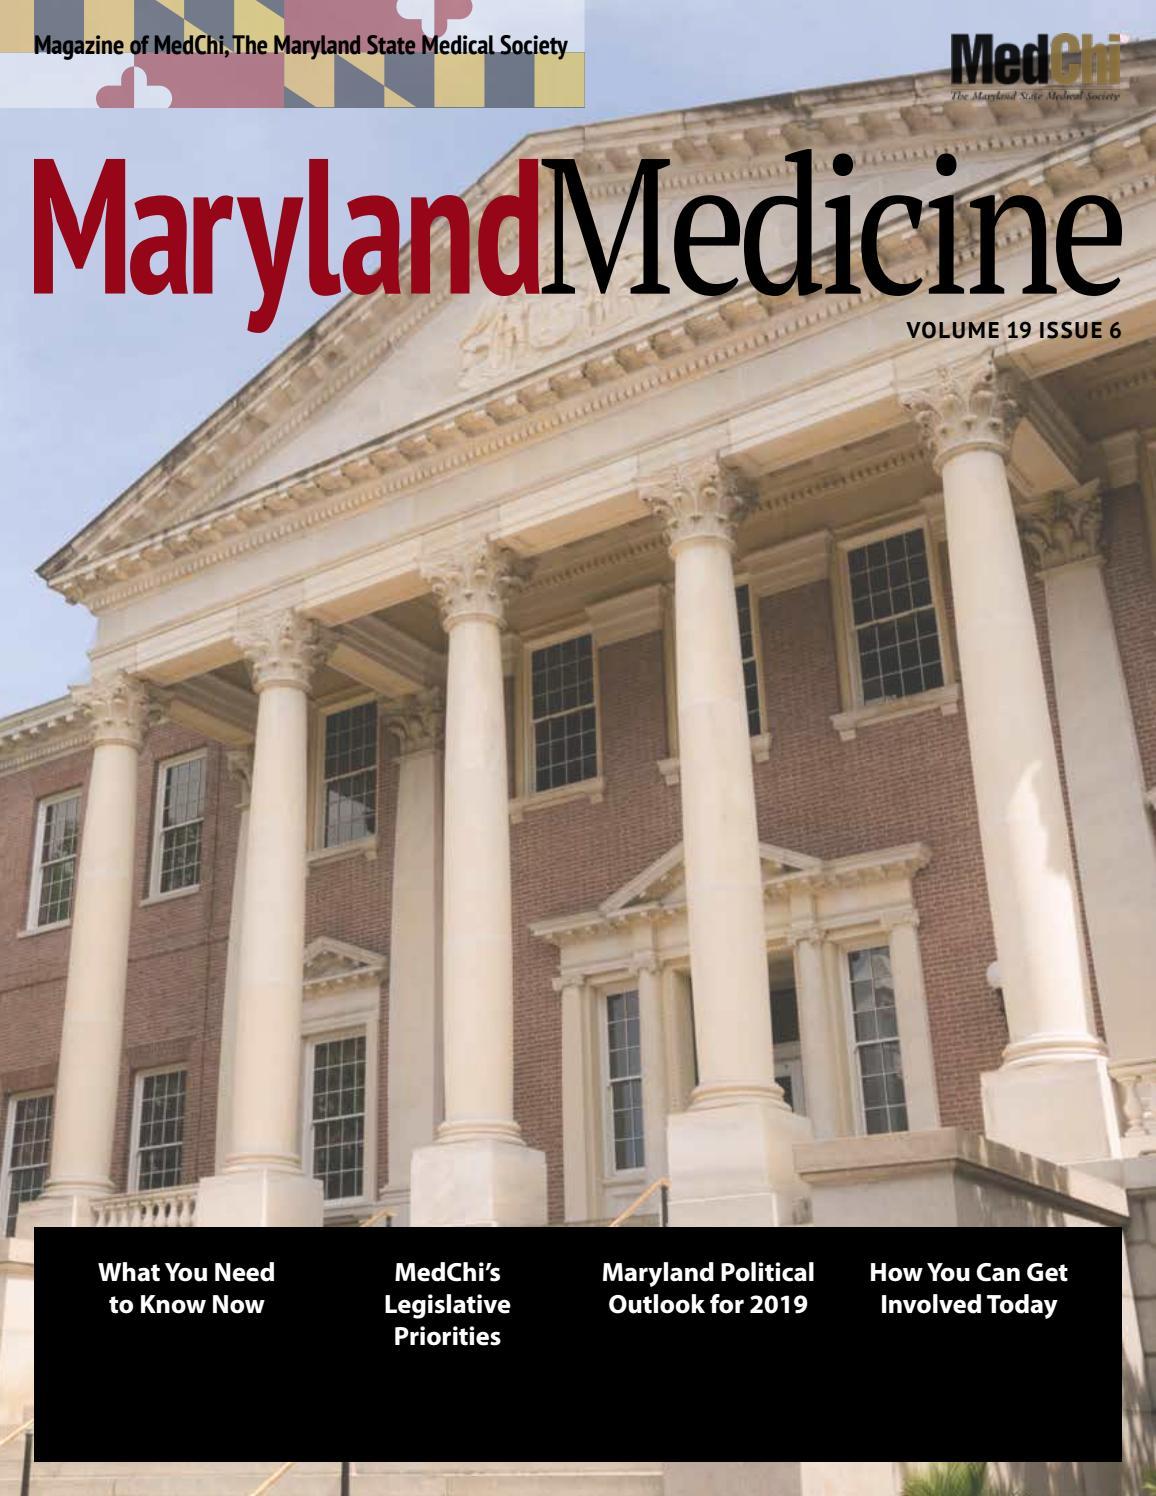 Gallery - MARYLAND HEALTH SOCIETY